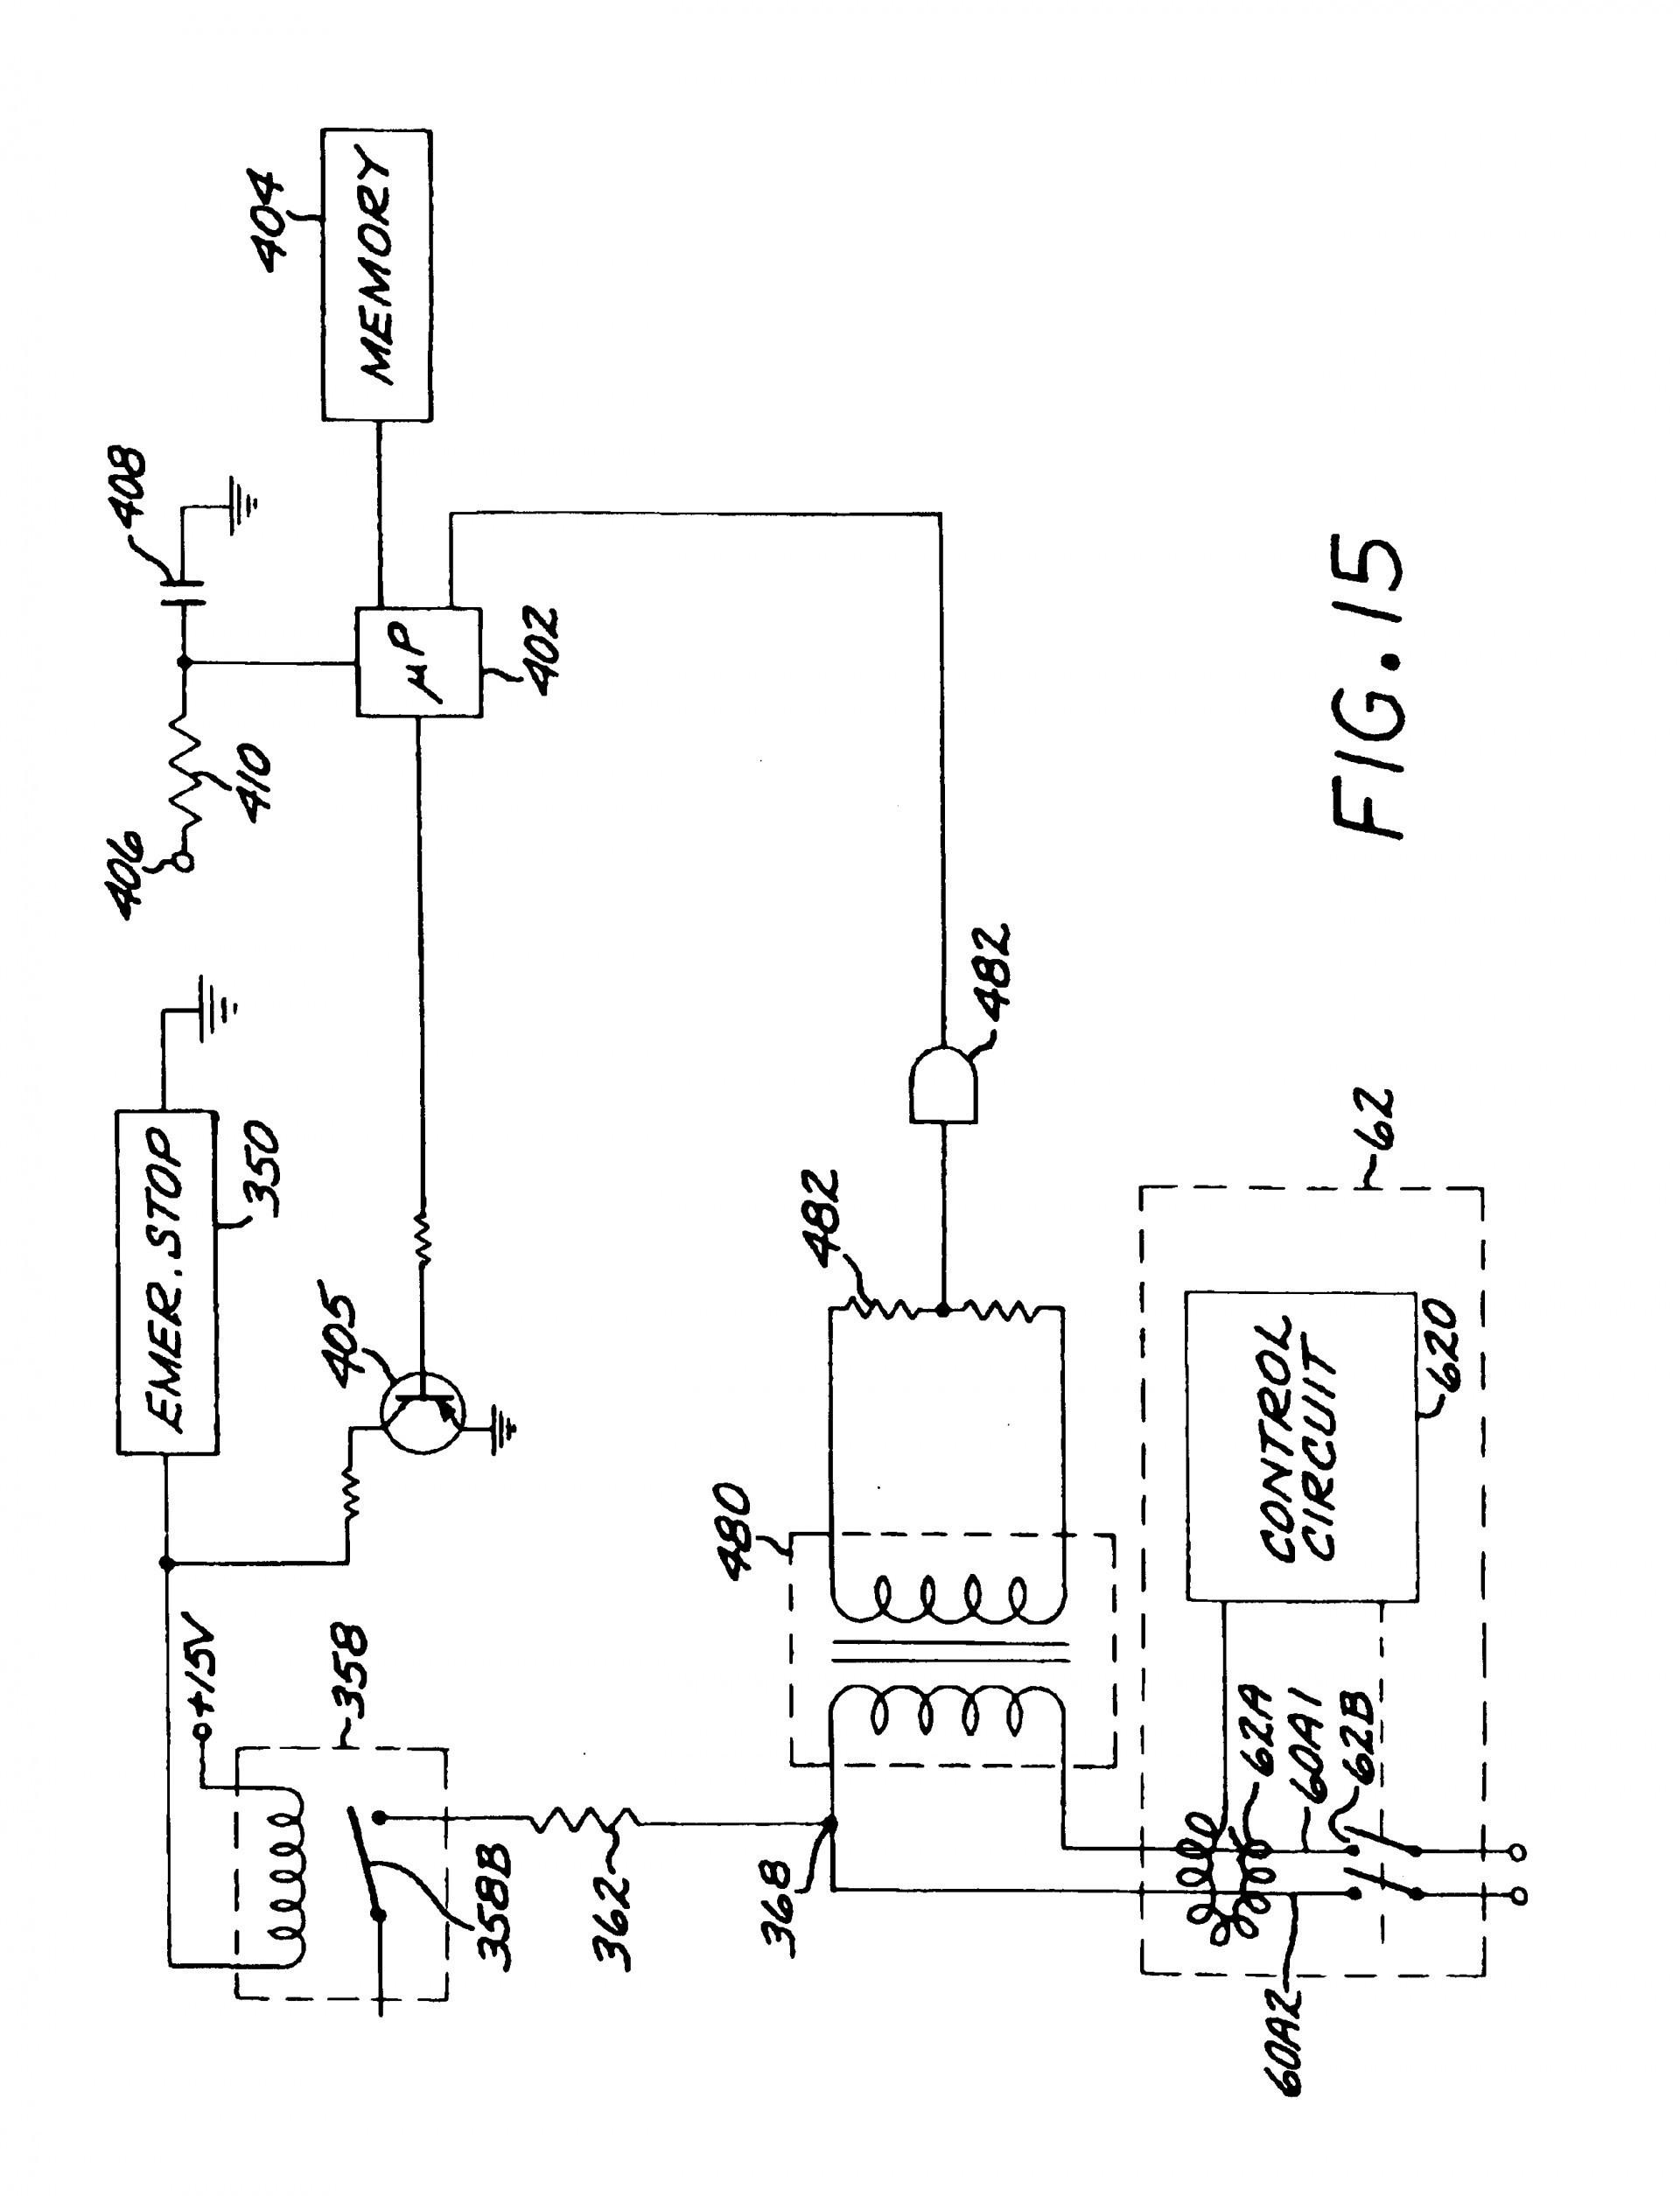 Hayward Super Pump Parts Diagram Wiring Diagram Pool Pump Motor Valid Fresh Pentair Pool Pump Wiring Of Hayward Super Pump Parts Diagram